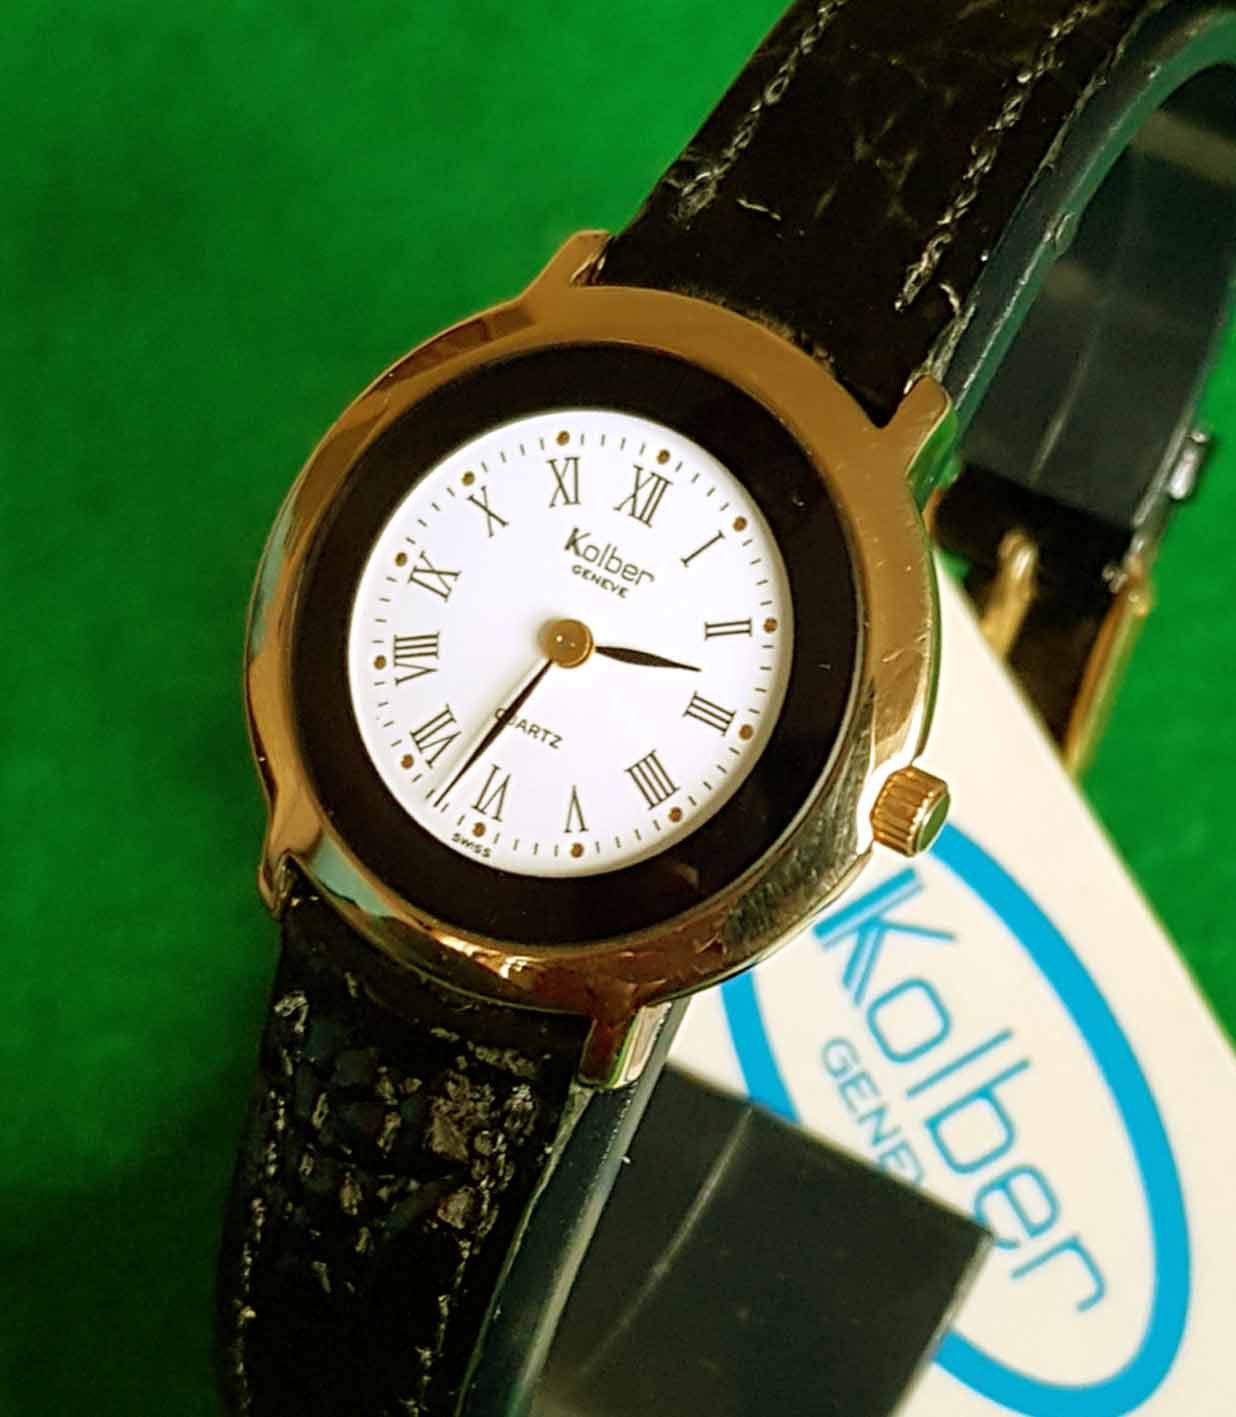 18kVintageNosnew Old Stock Electroplated Reloj Kolber FJTlK1c